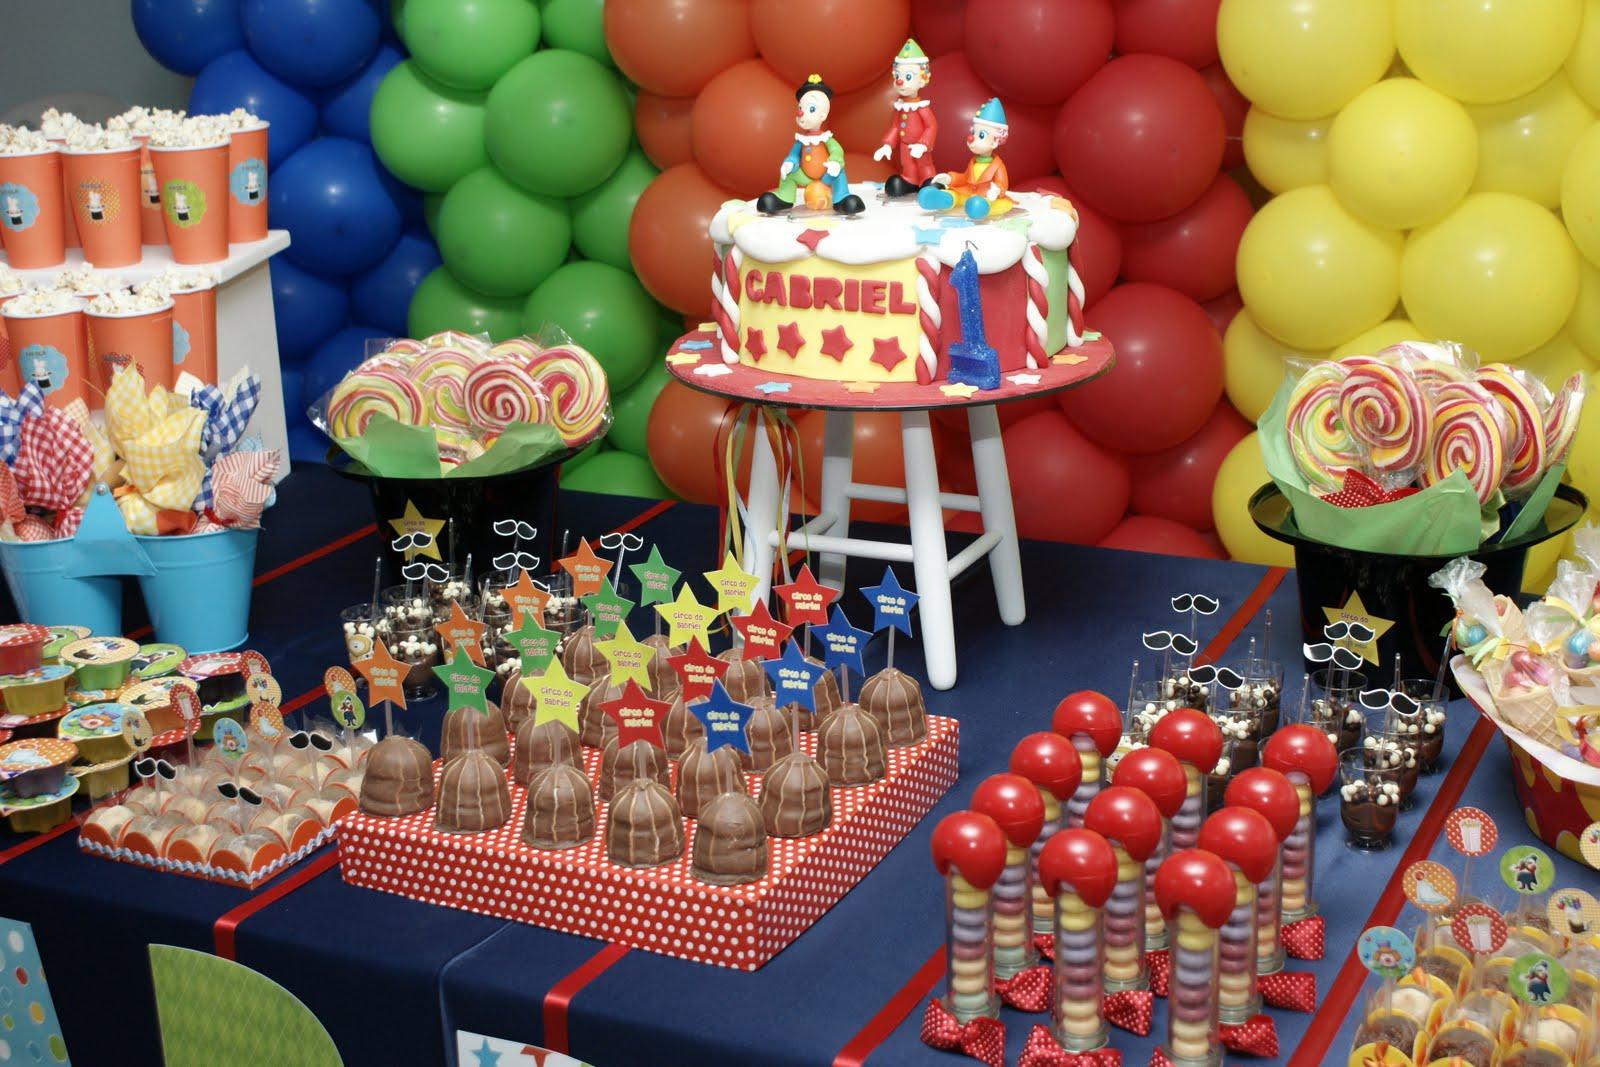 decoracao festa infantil circo:Mamãe Mode On: Decorando Circo